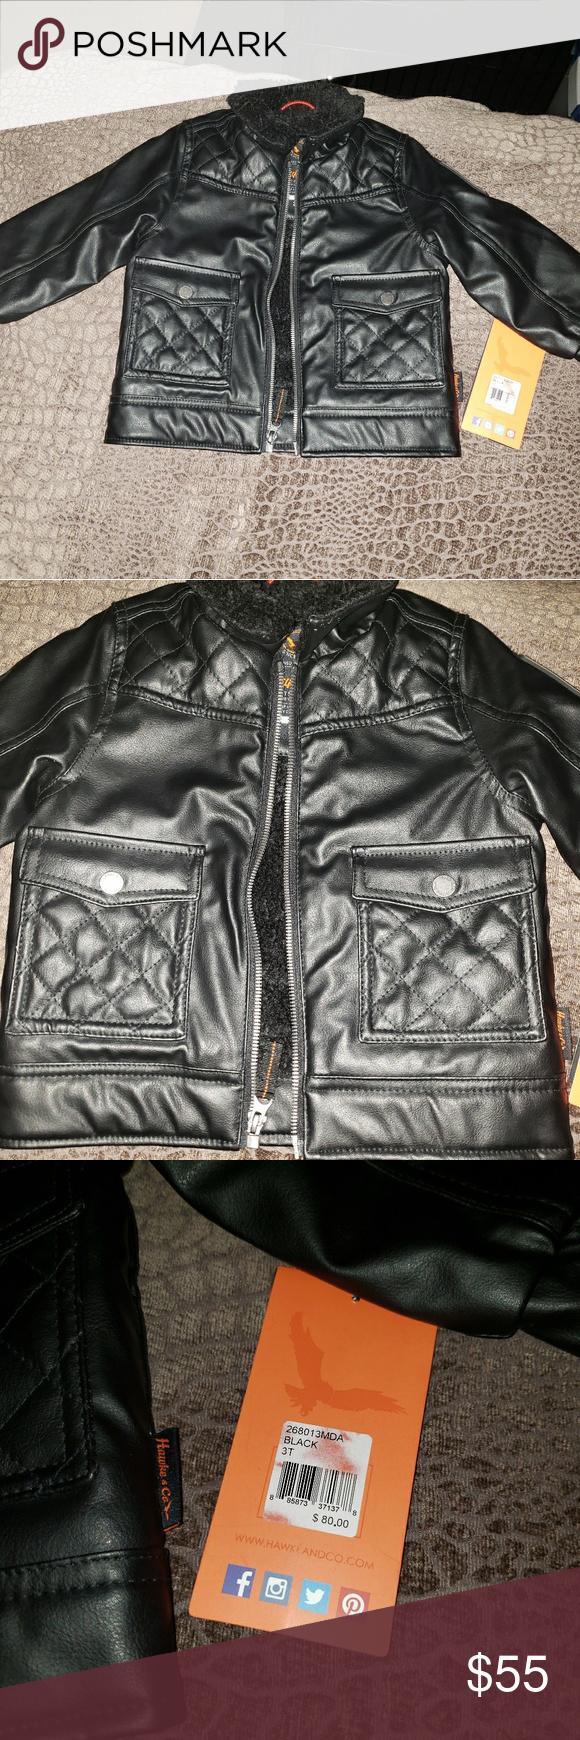 Nwt Toddler Jacket 3t Toddler Jacket Jackets Clothes Design [ 1740 x 580 Pixel ]